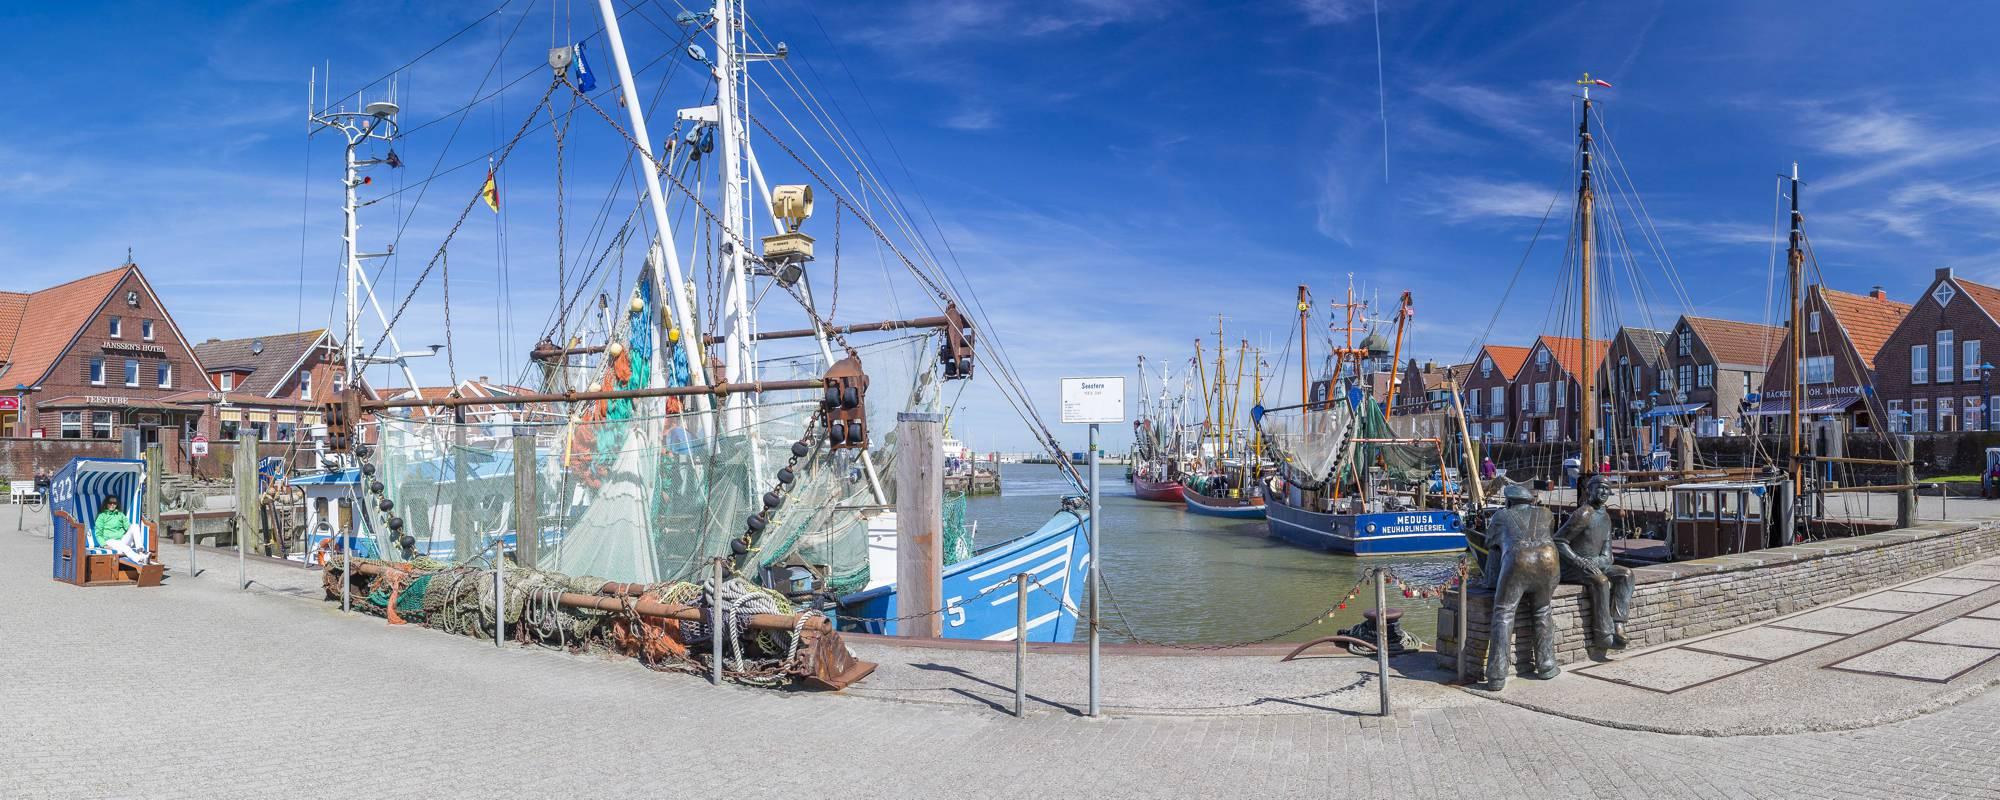 Lieblingsplätze Neuharlingersiel - Kutterhafen